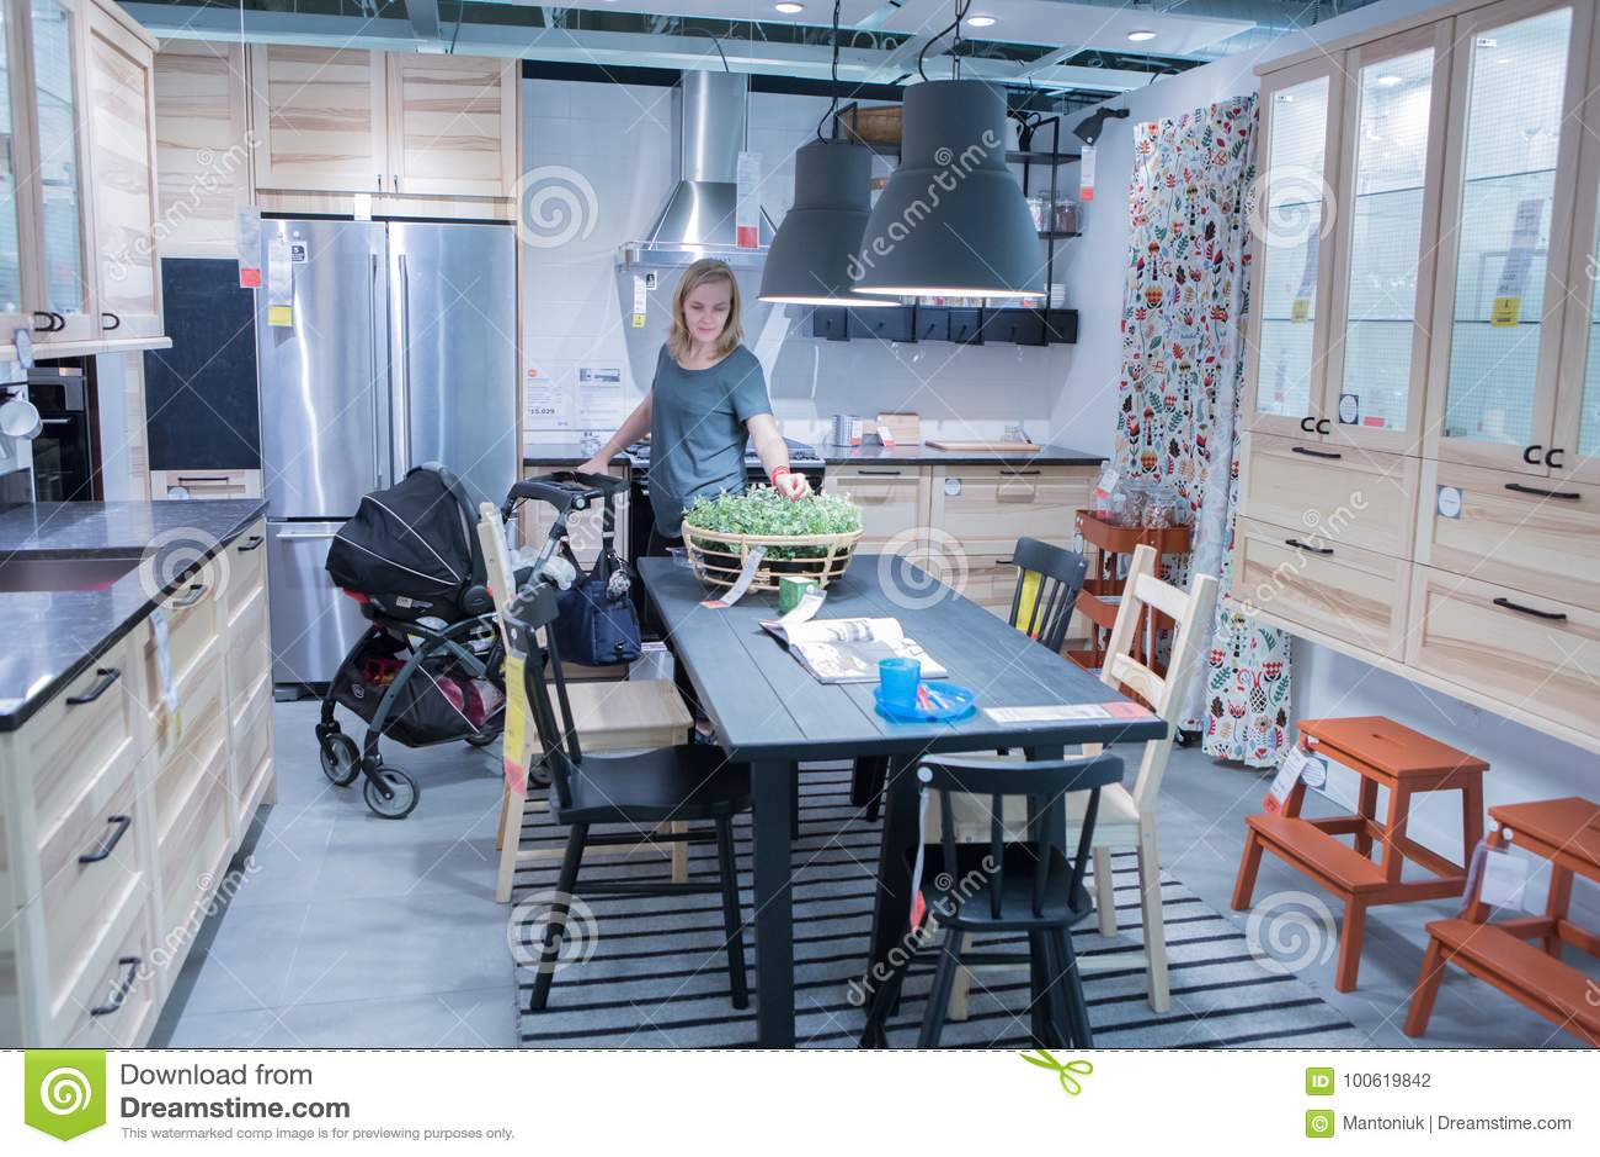 kitchen displays commercial equipment 宜家展示室图库摄影片 图片包括有卡罗来纳州 多数 女孩 人们 现代 现代厨房展示室一致宜家的地点